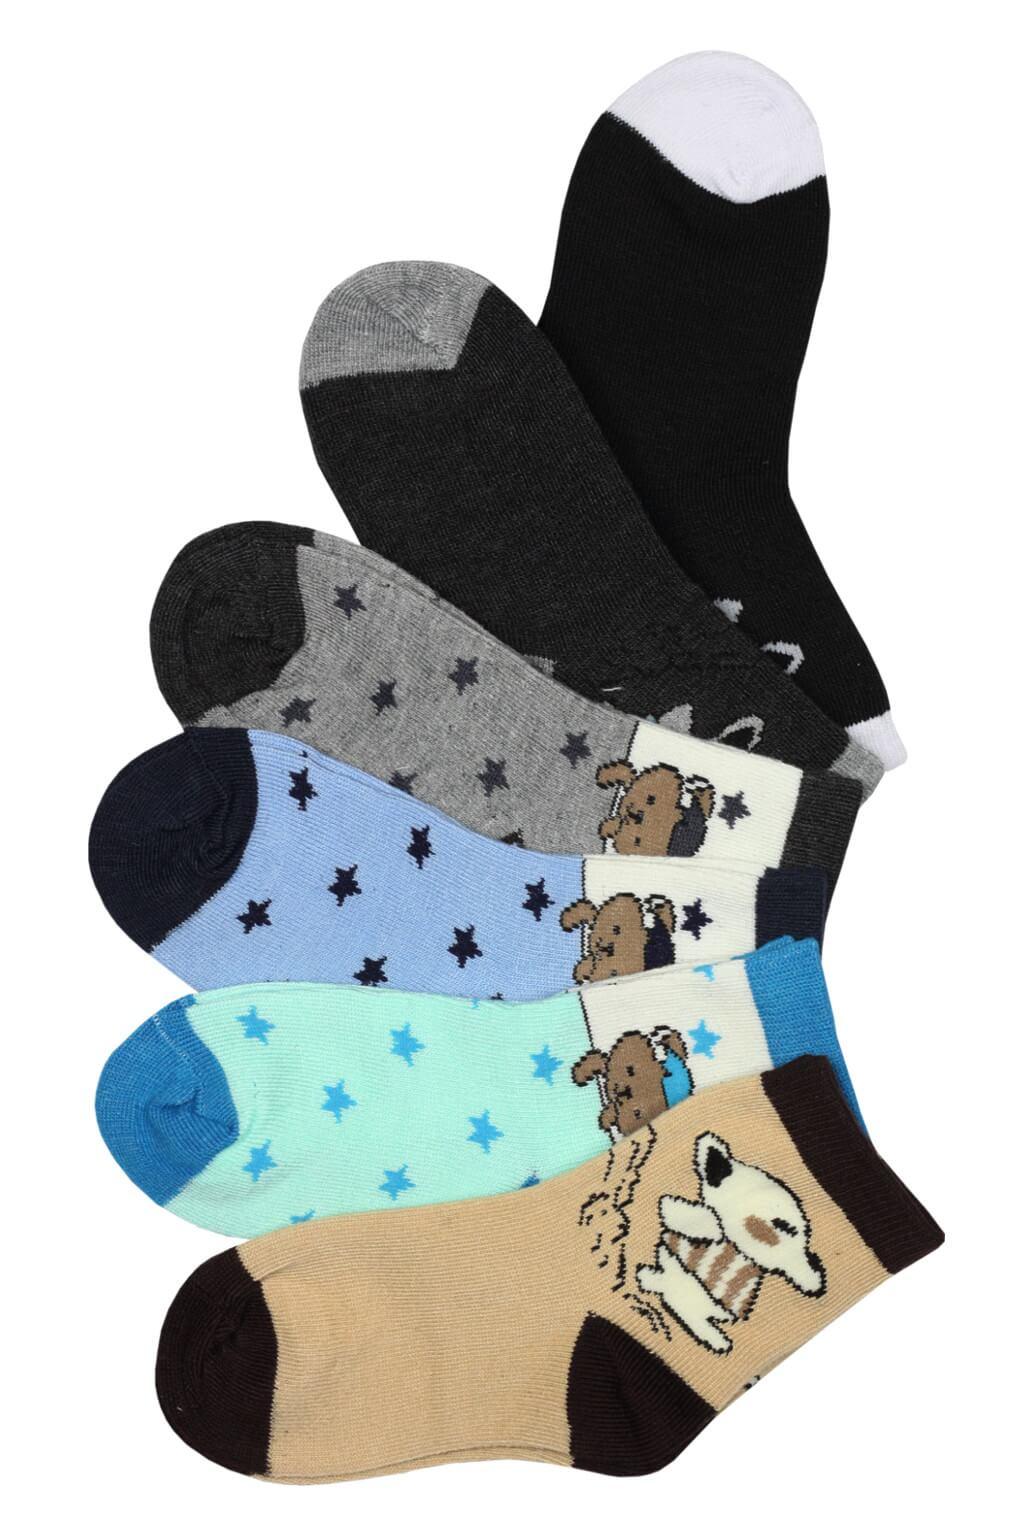 Kids Classic ponožky - 3bal 9-10 let MIX